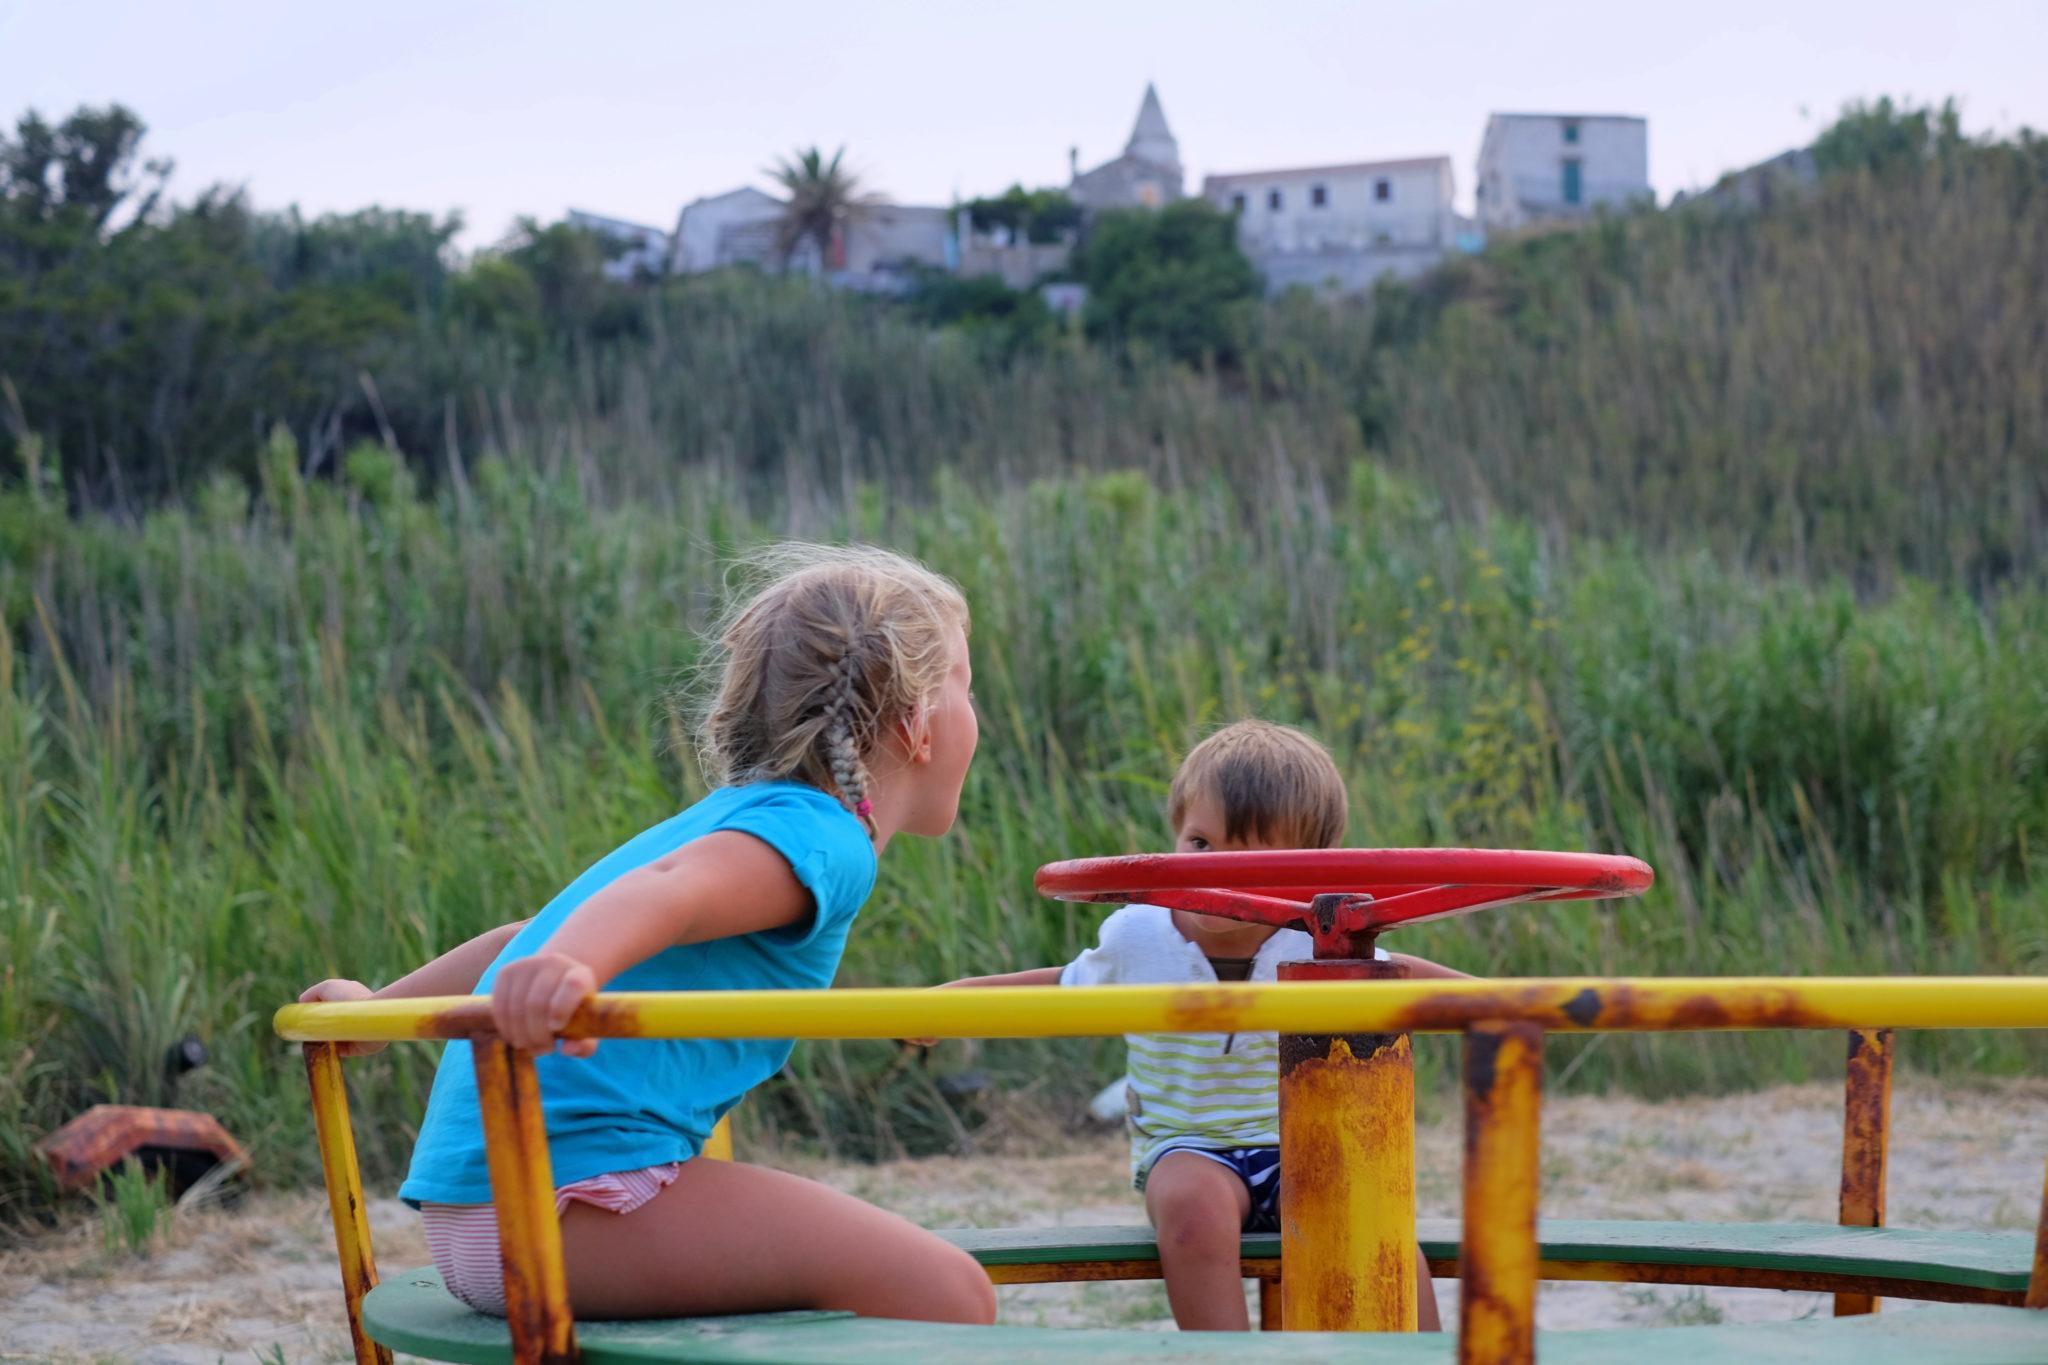 Susak and children playground